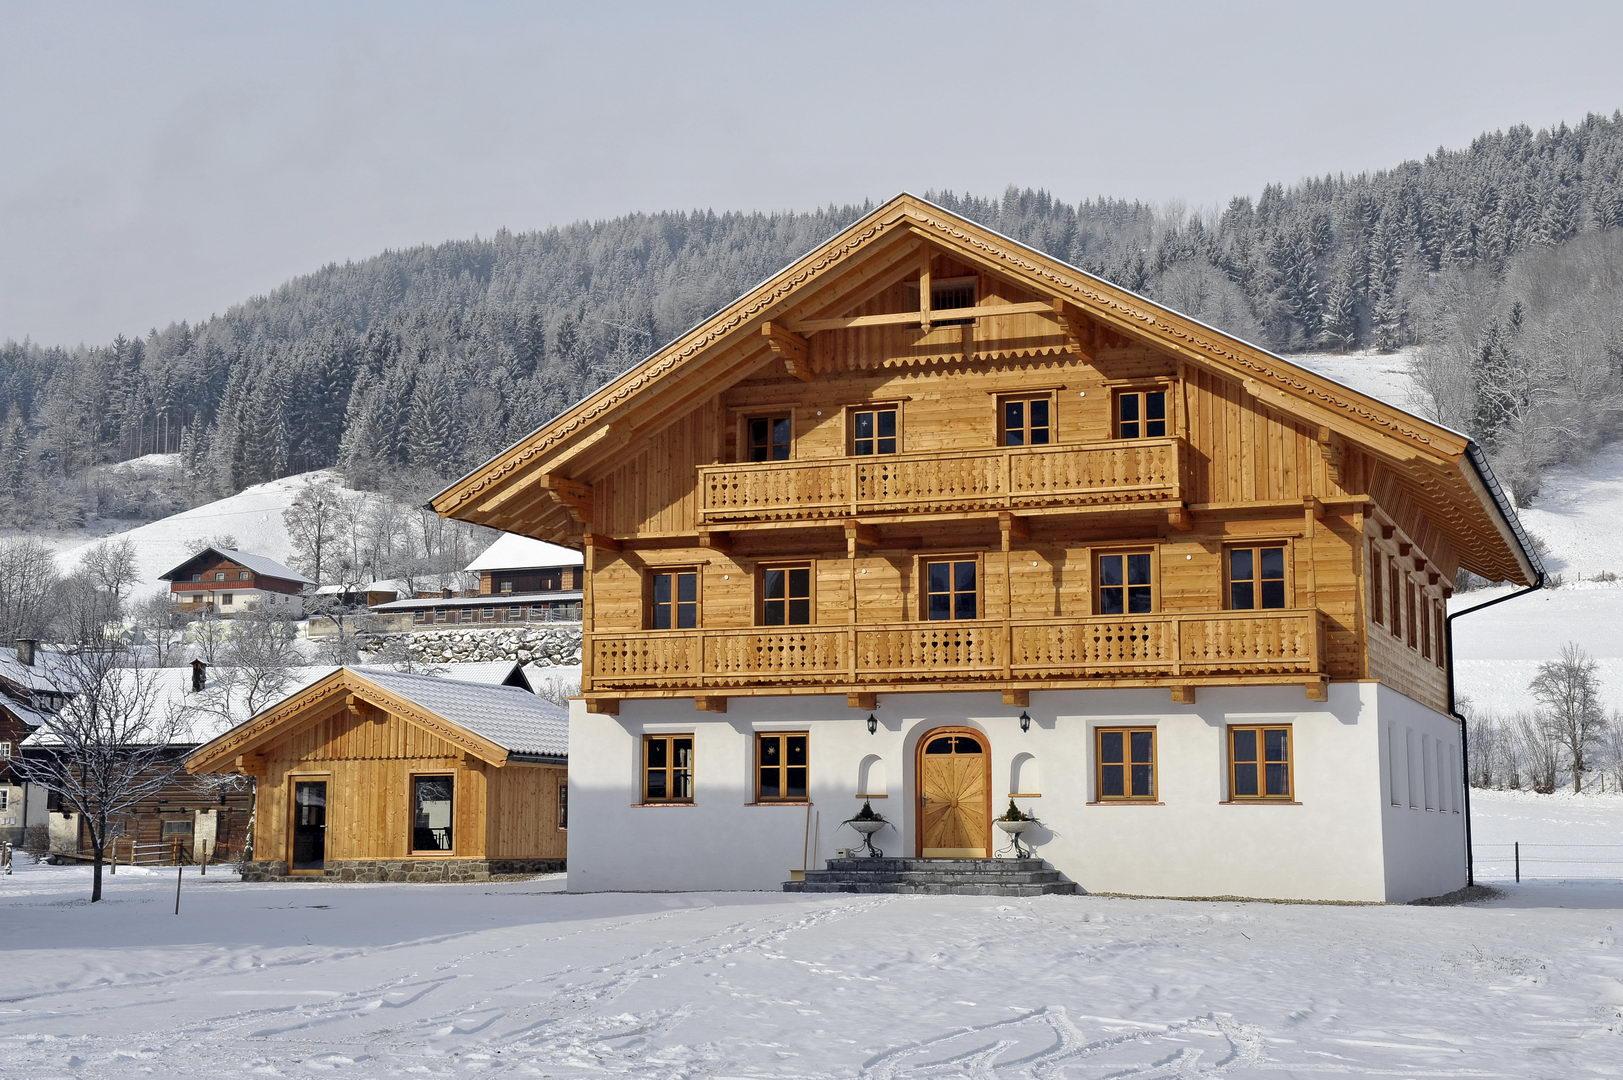 hinkerhof-im-winter